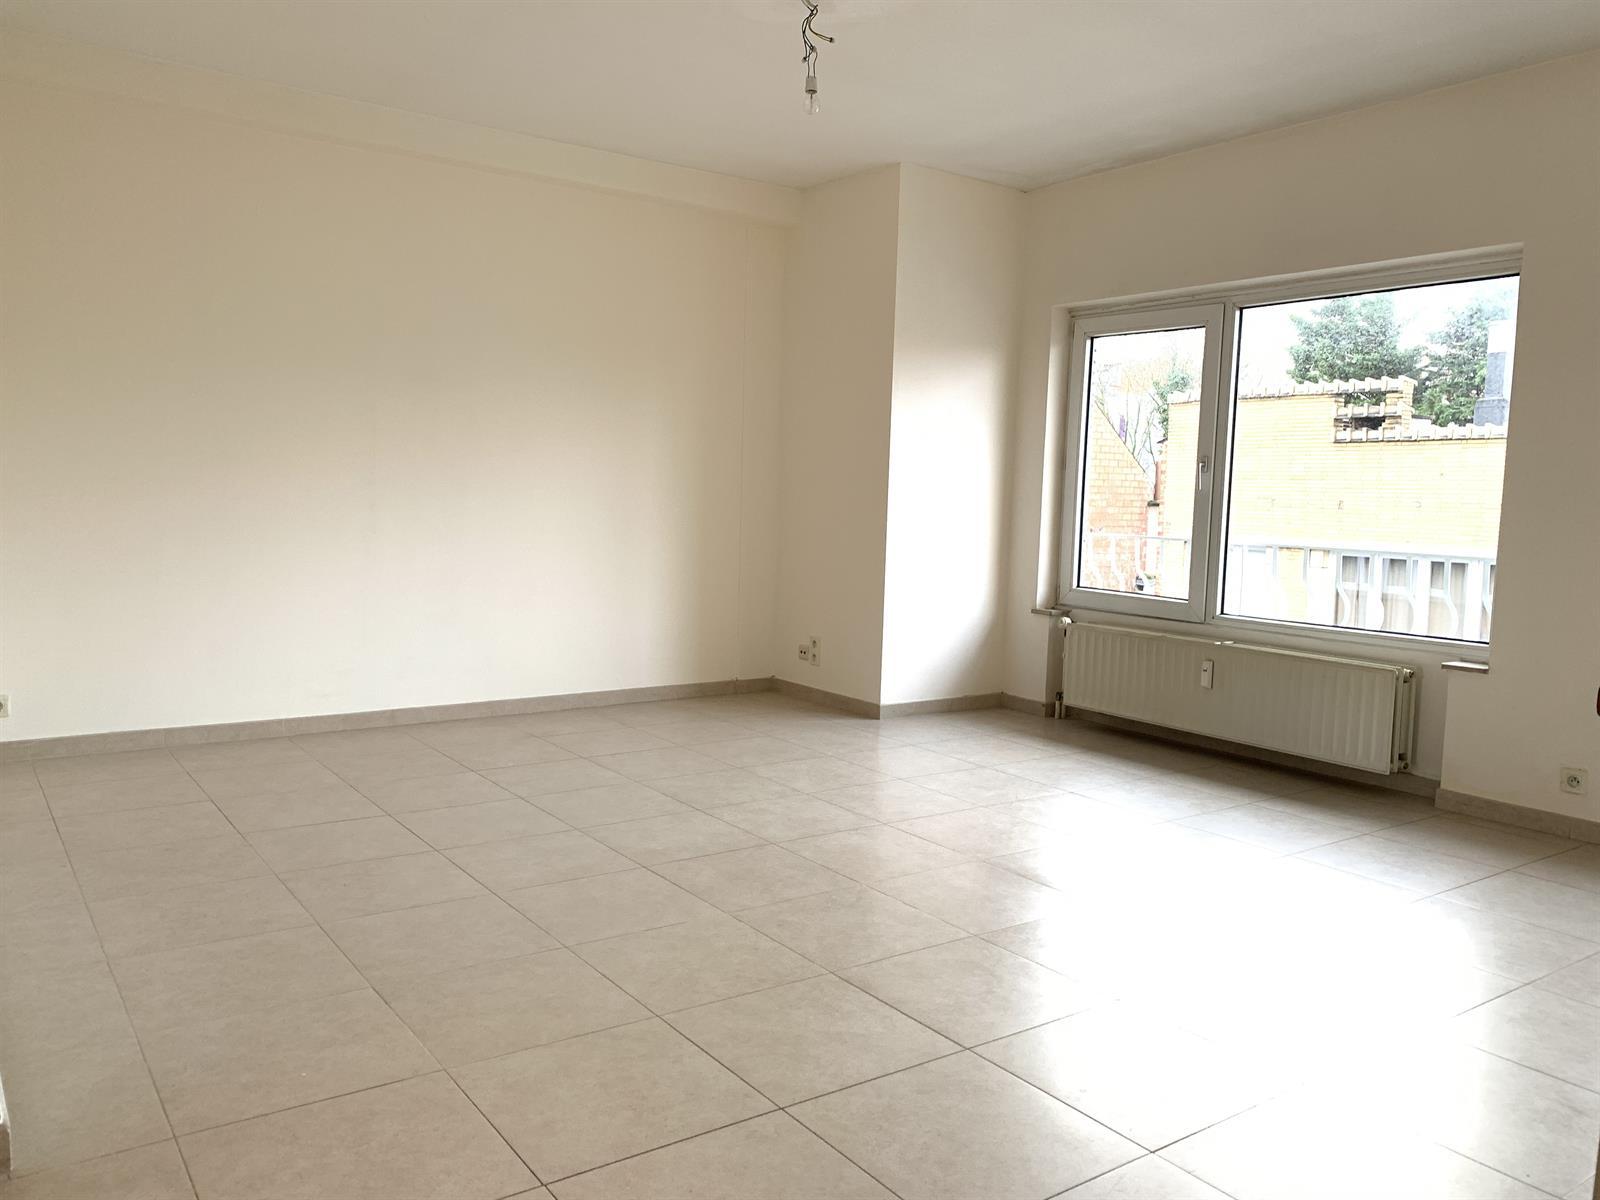 Appartement - Ganshoren - #3973643-6